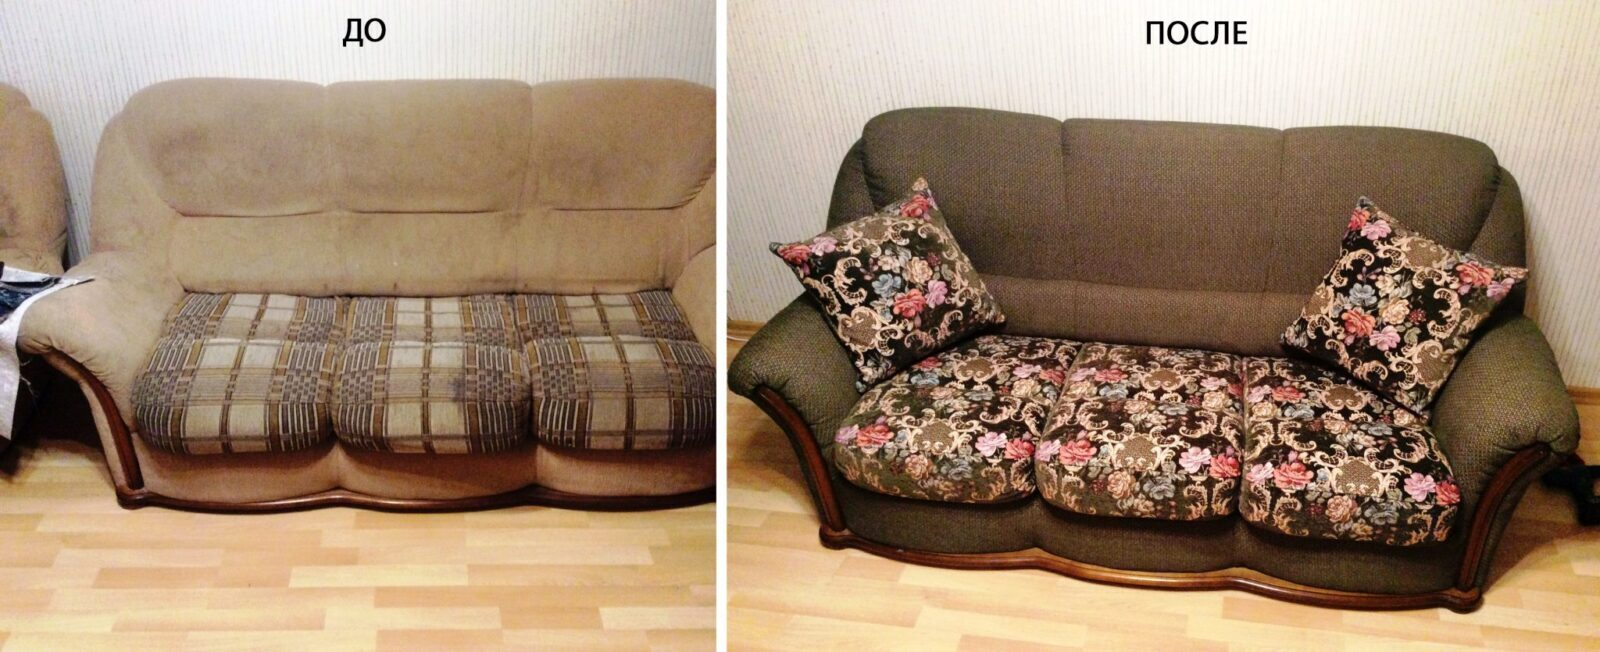 Картинки перетяжка дивана